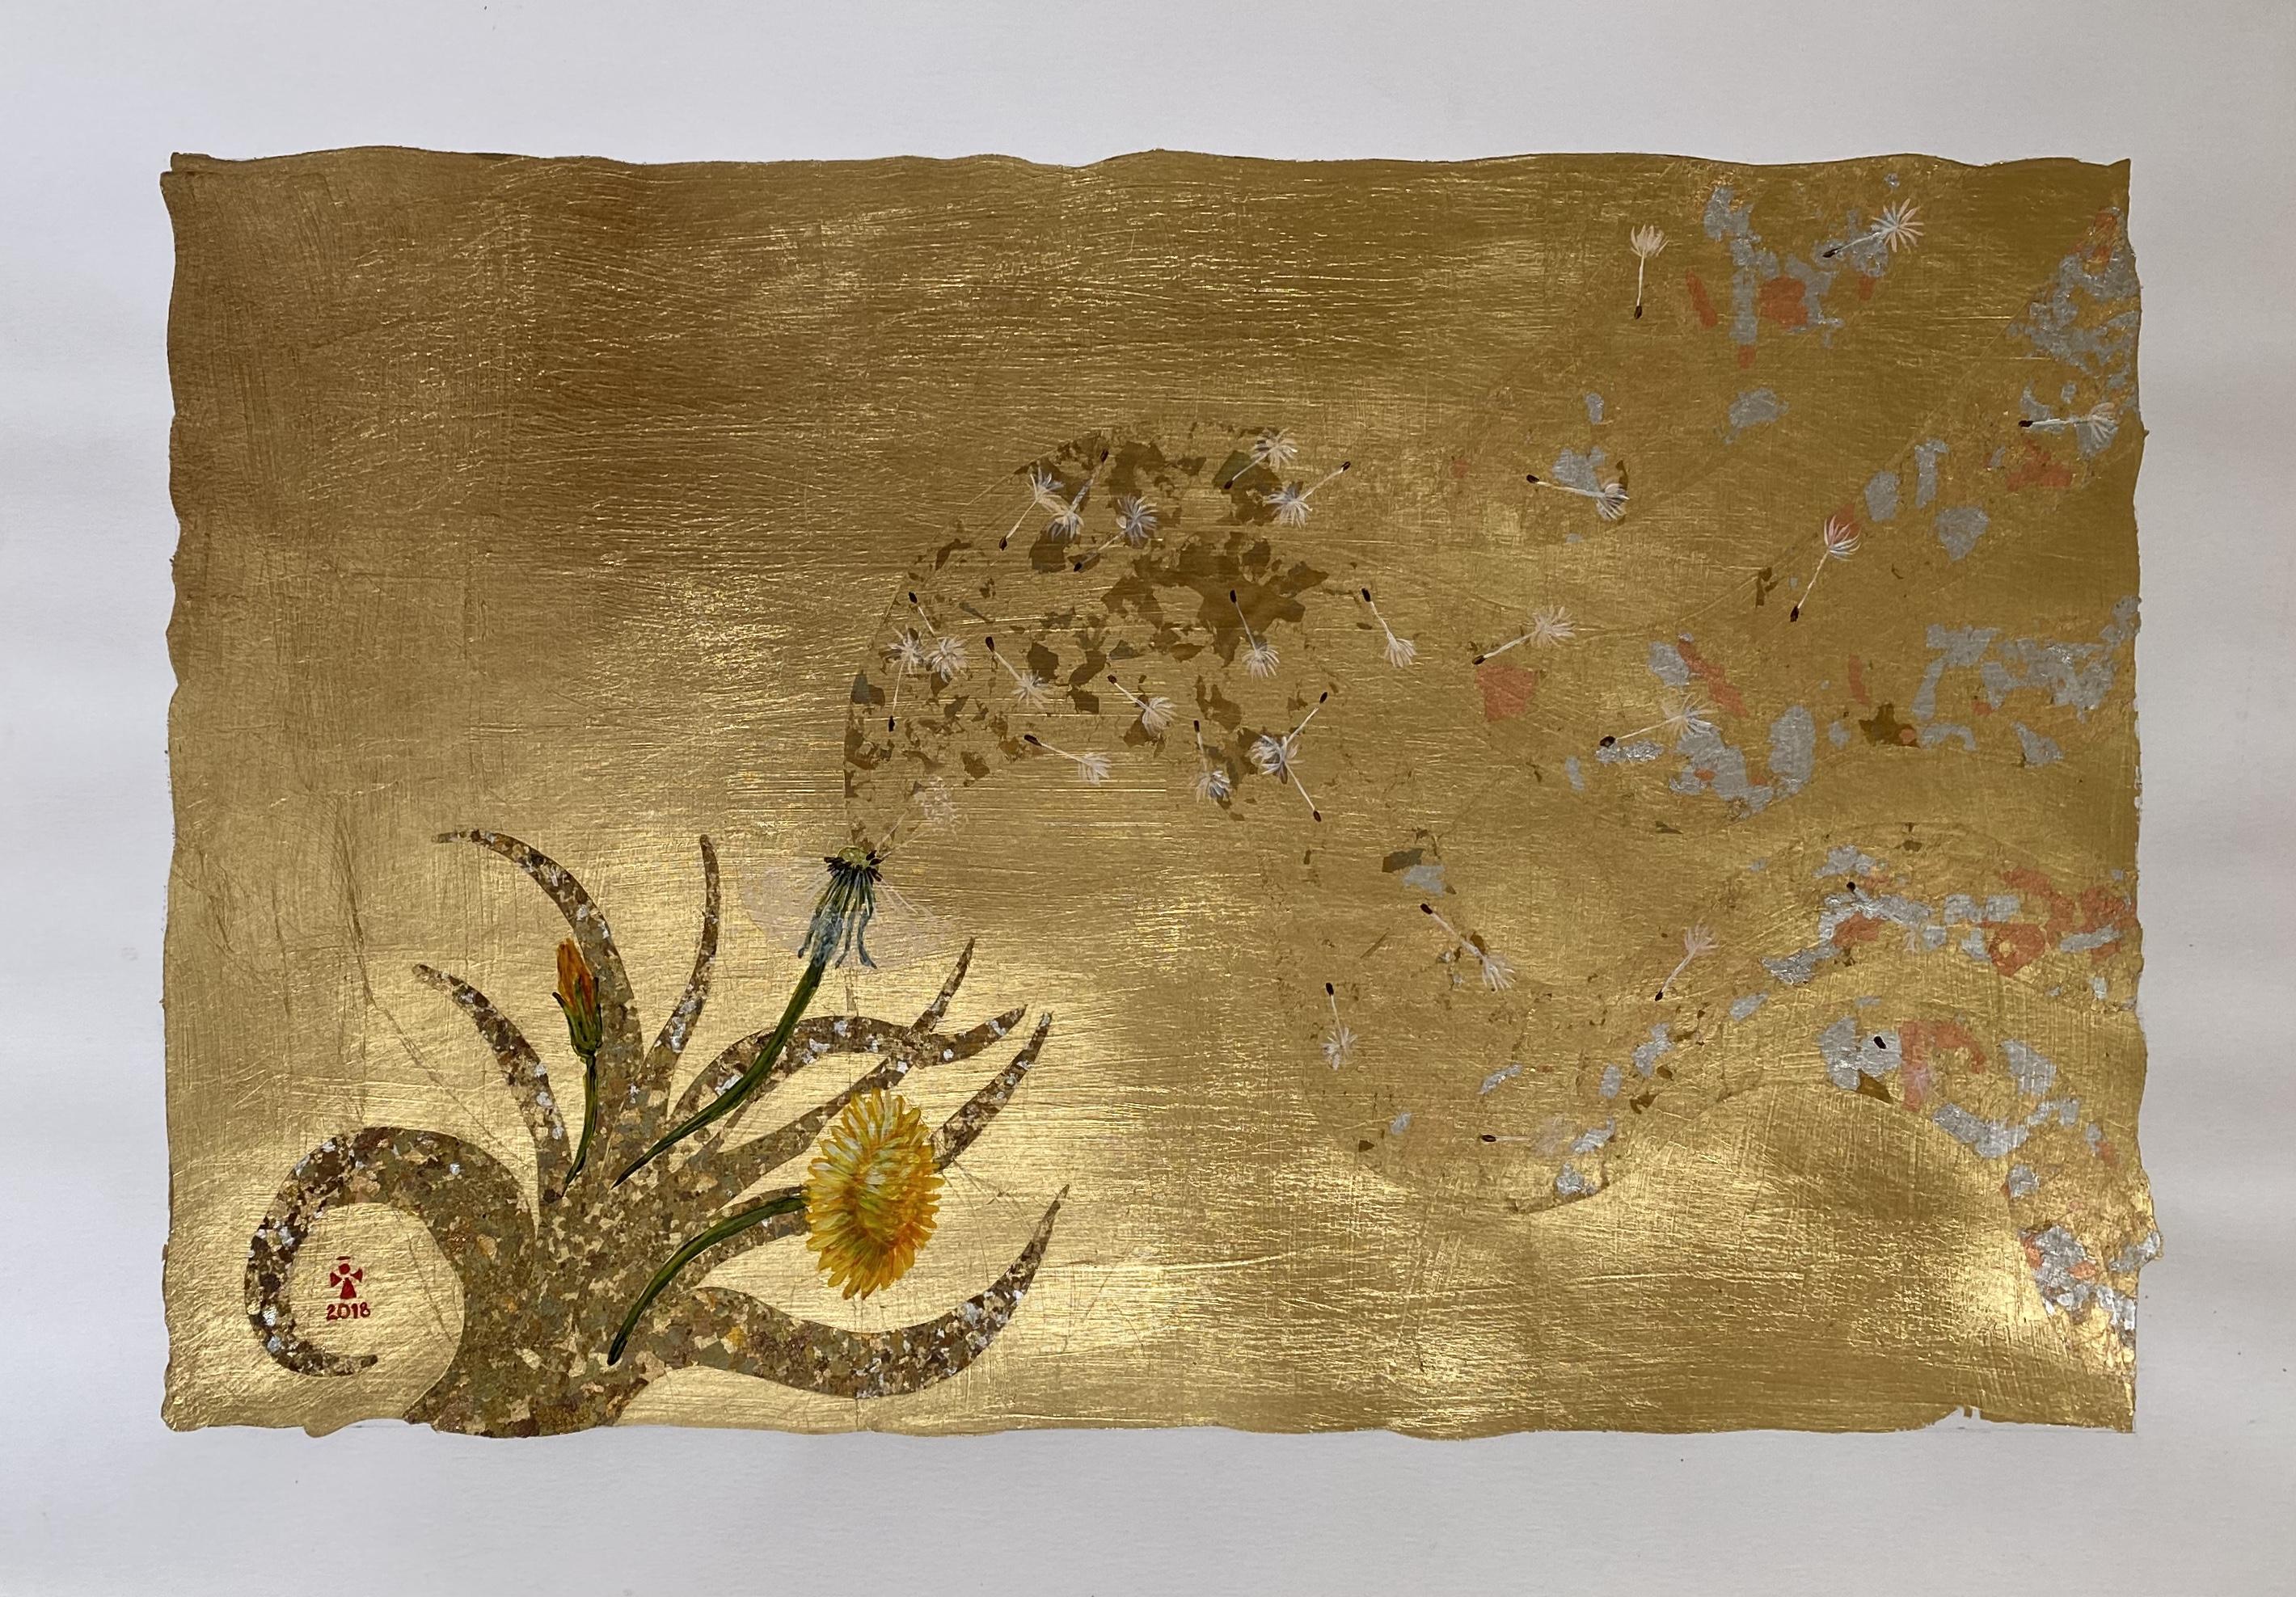 Dandelion in Wind - Angeles Salinas - 19'' x 14'' - Mixed Media on Paper